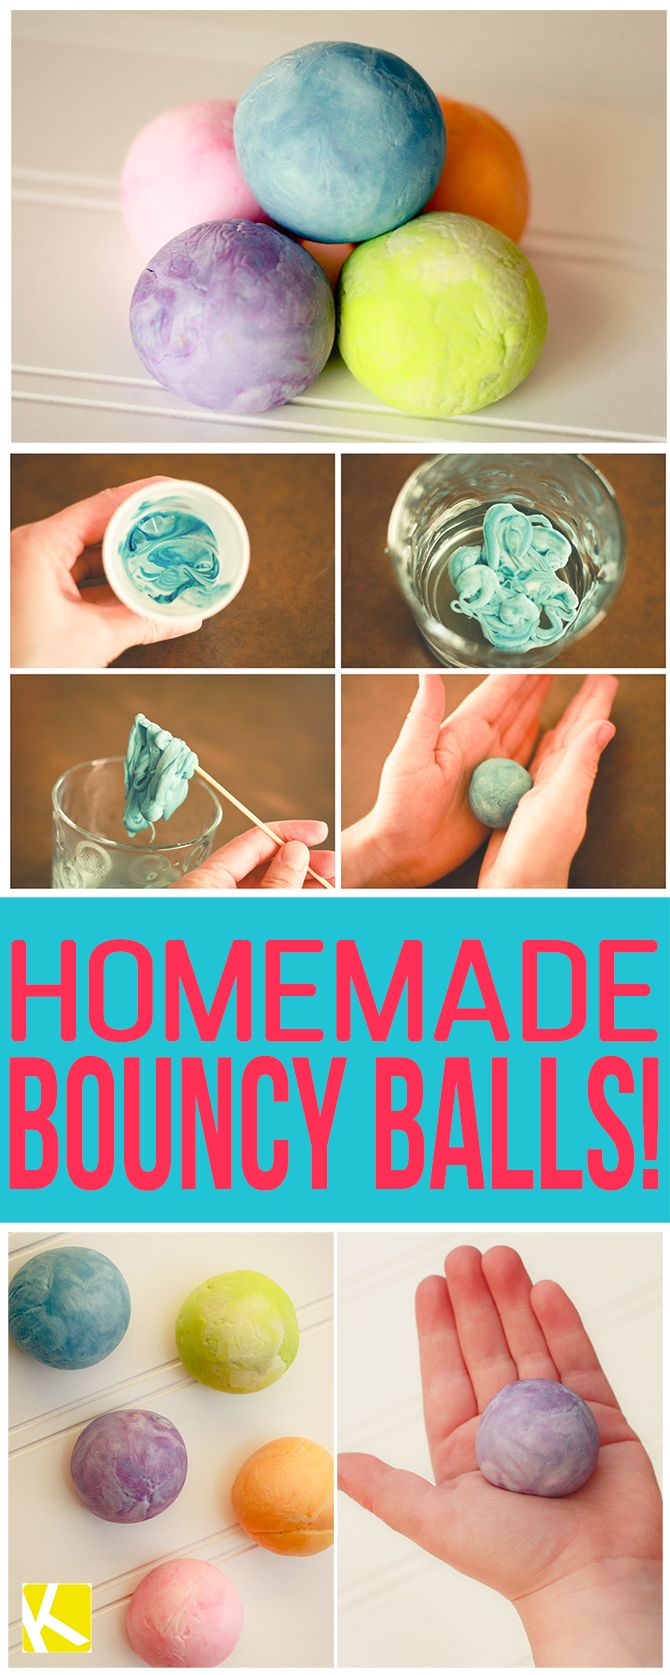 Homemade+Bouncy+Balls!